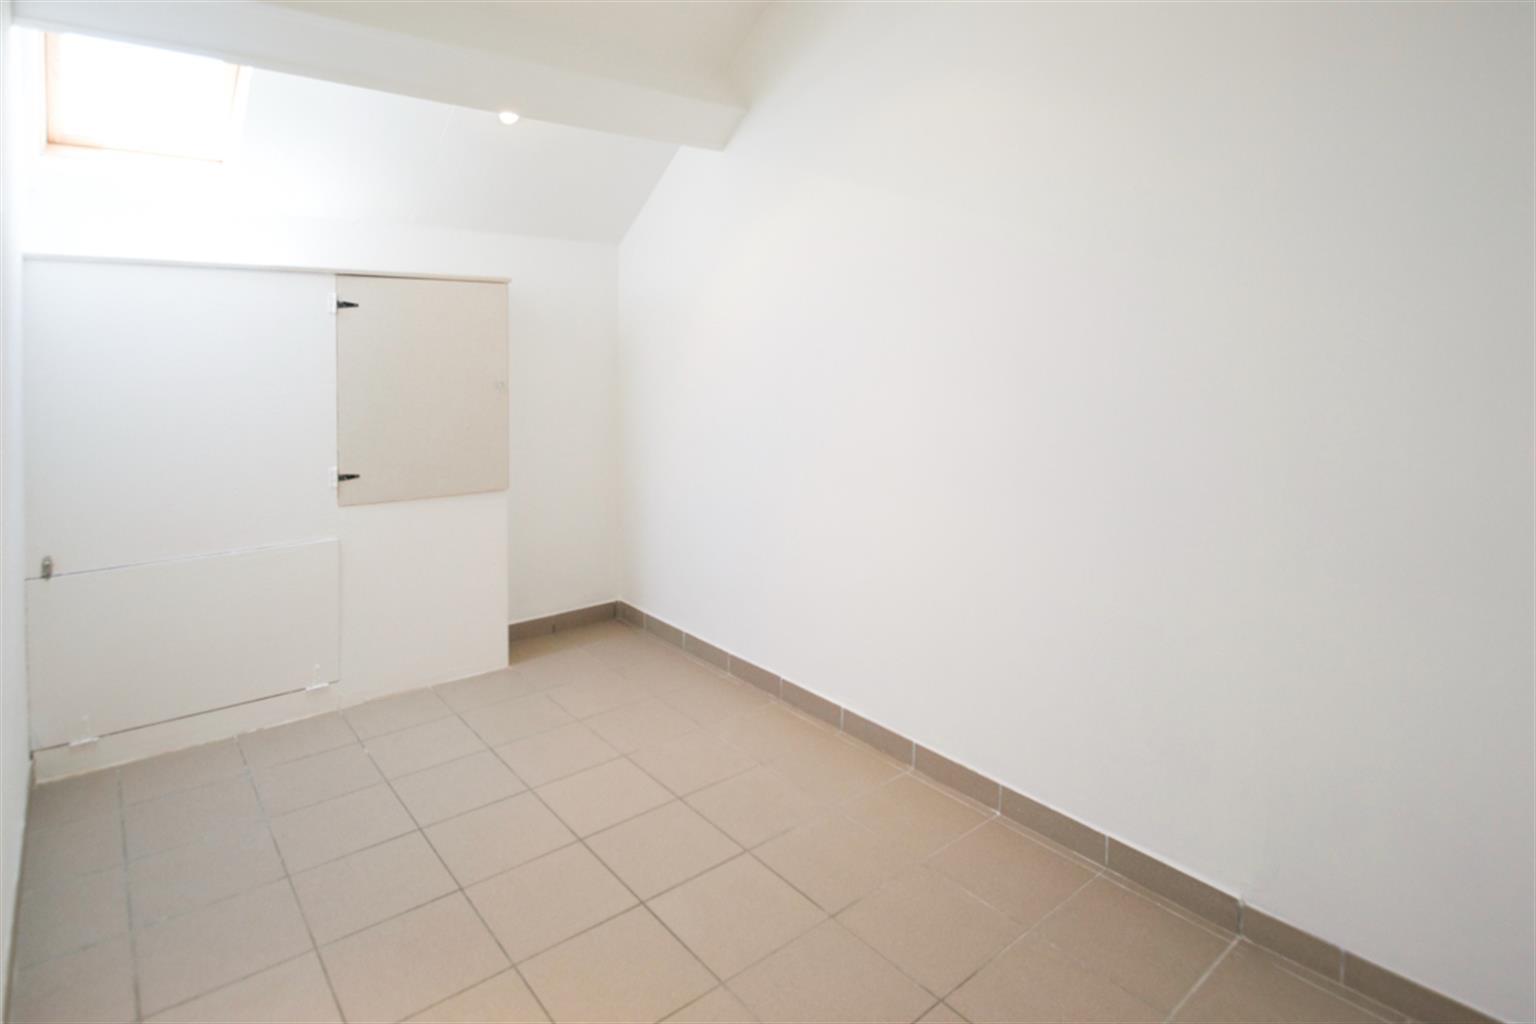 Appartement - Leval-Trahegnies - #3454438-5